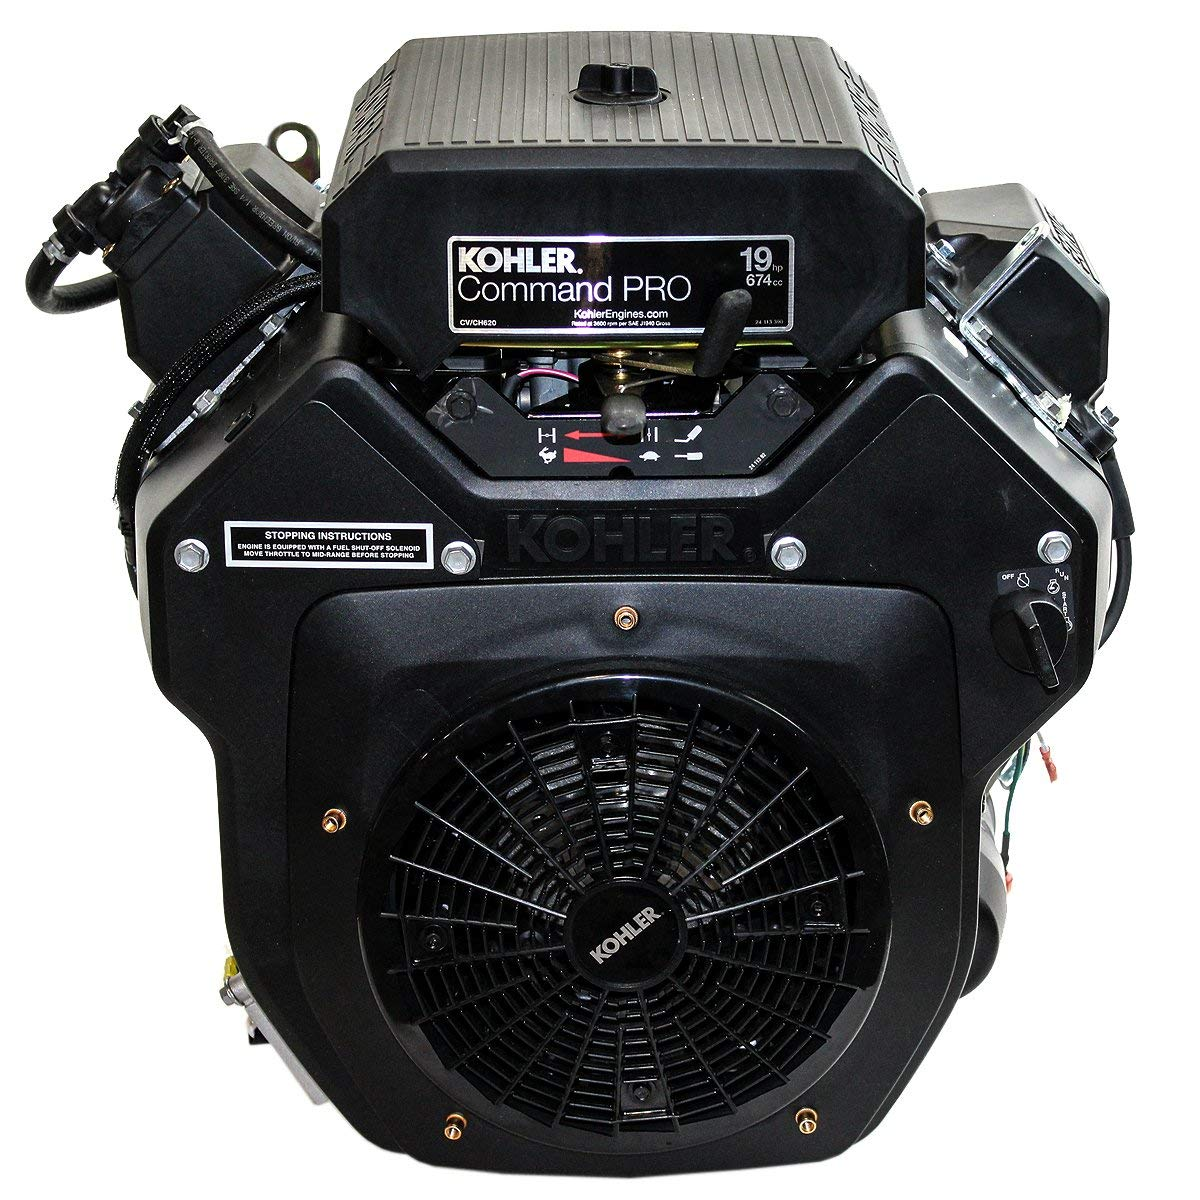 Cheap 6 Hp Horizontal Shaft Engine, find 6 Hp Horizontal